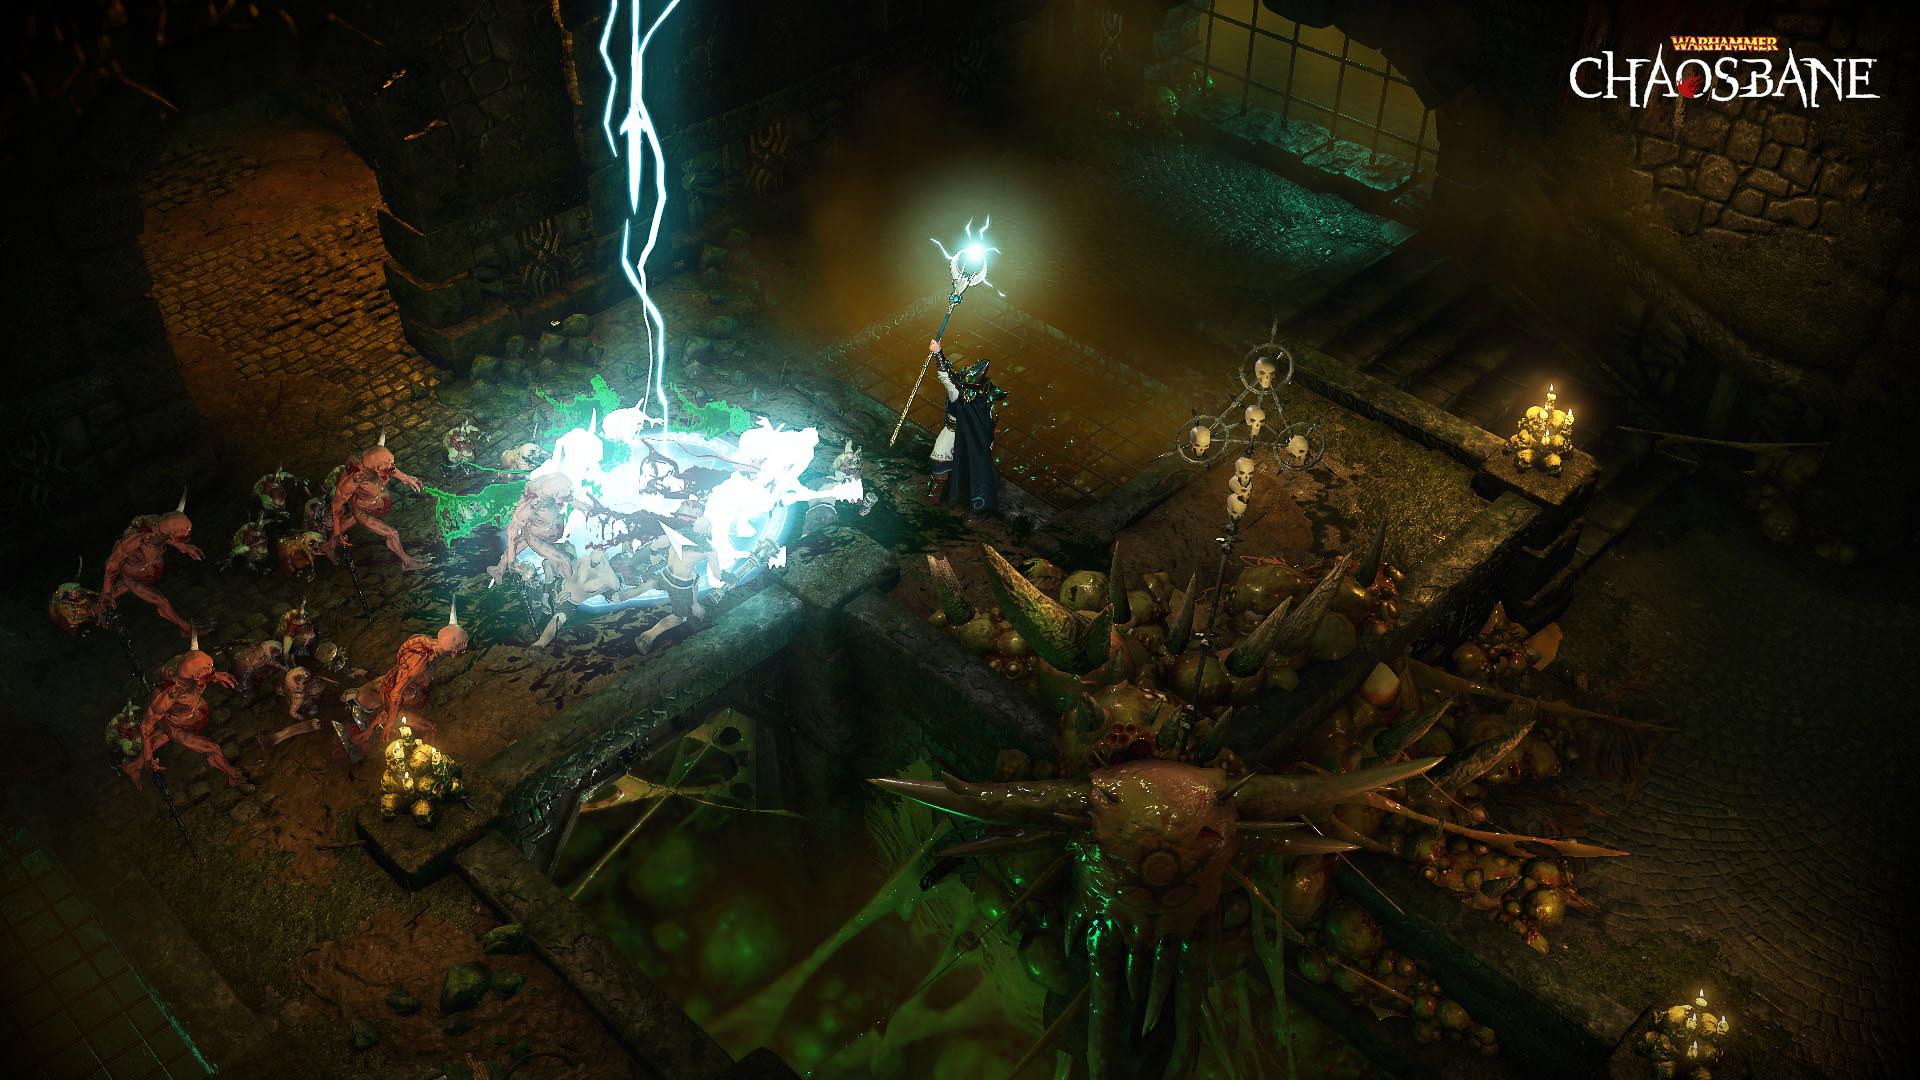 Warhammer: Chaosbane impressions: A slash-and-grab good time